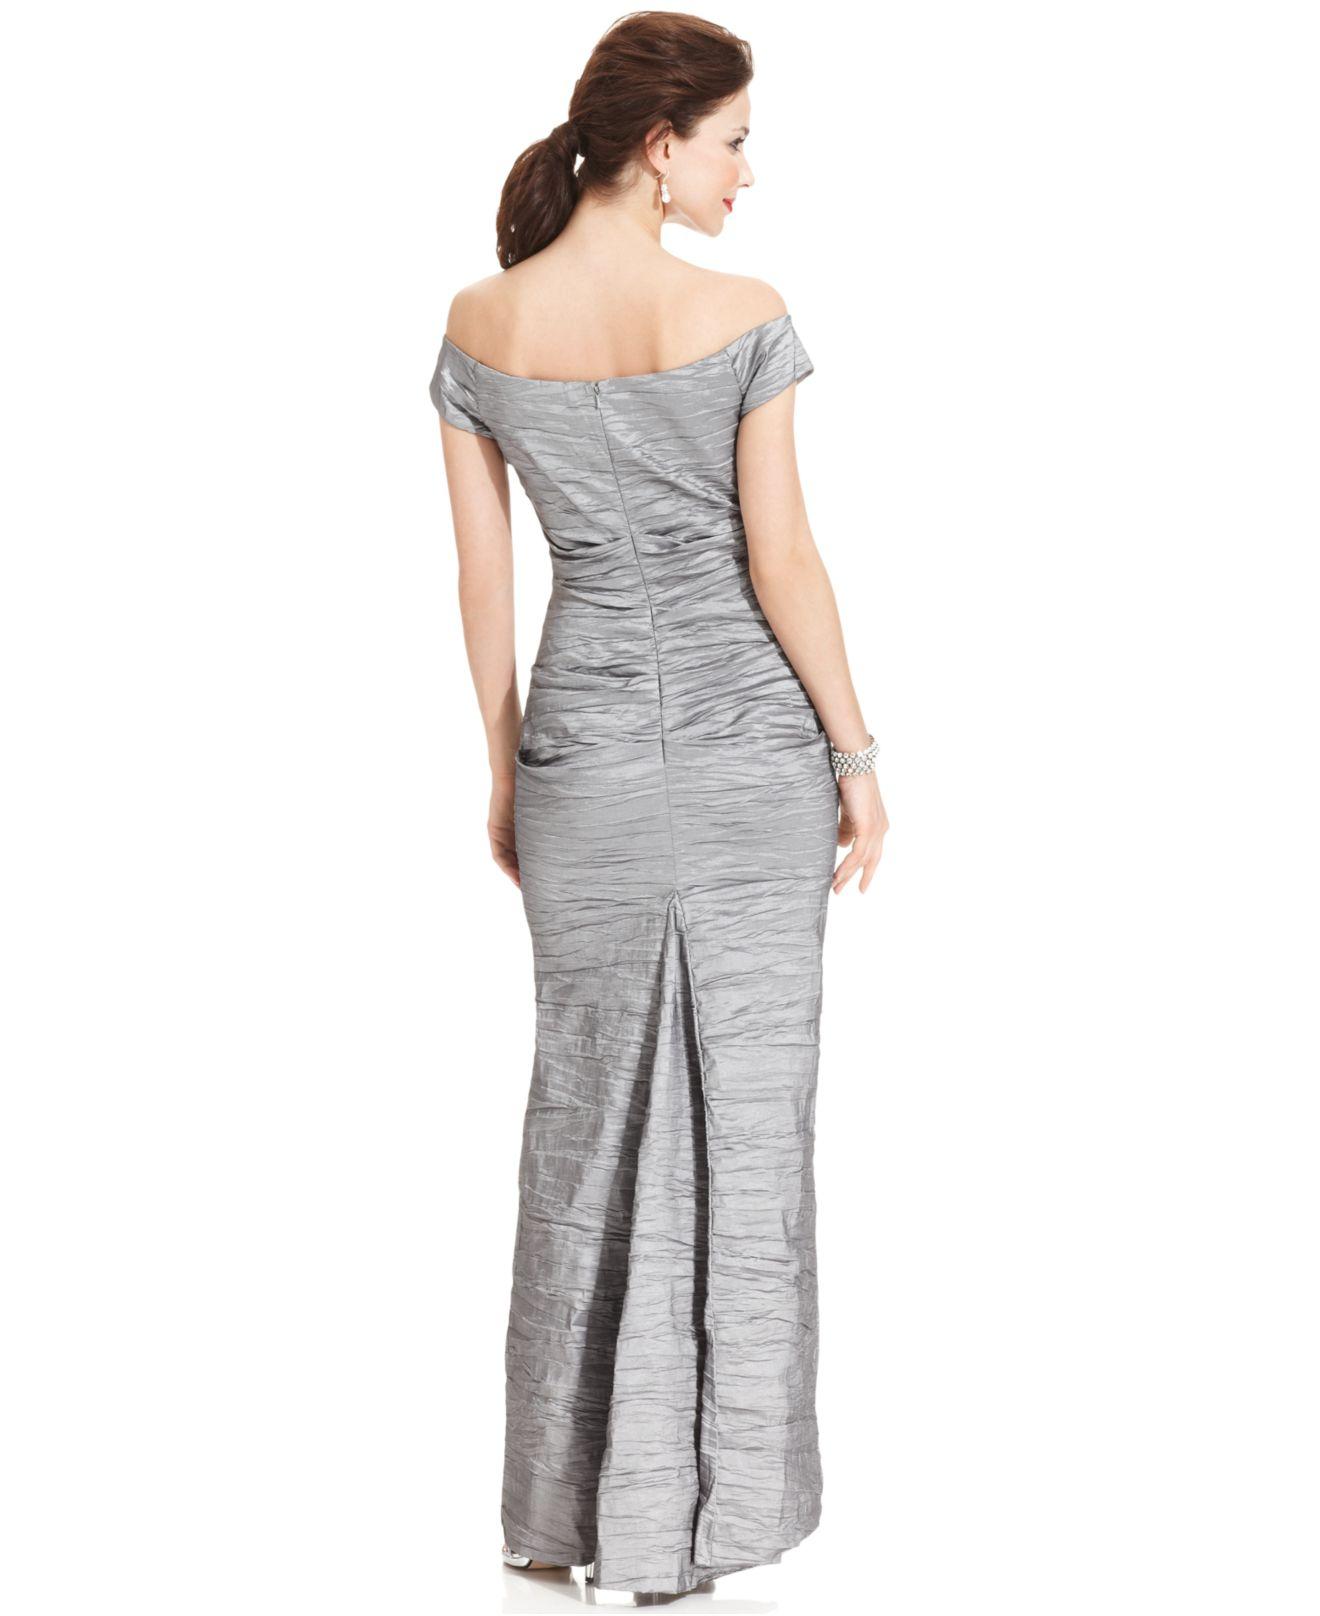 b3a095038e Lyst - Alex Evenings Off-the-shoulder Taffeta Evening Gown in Metallic